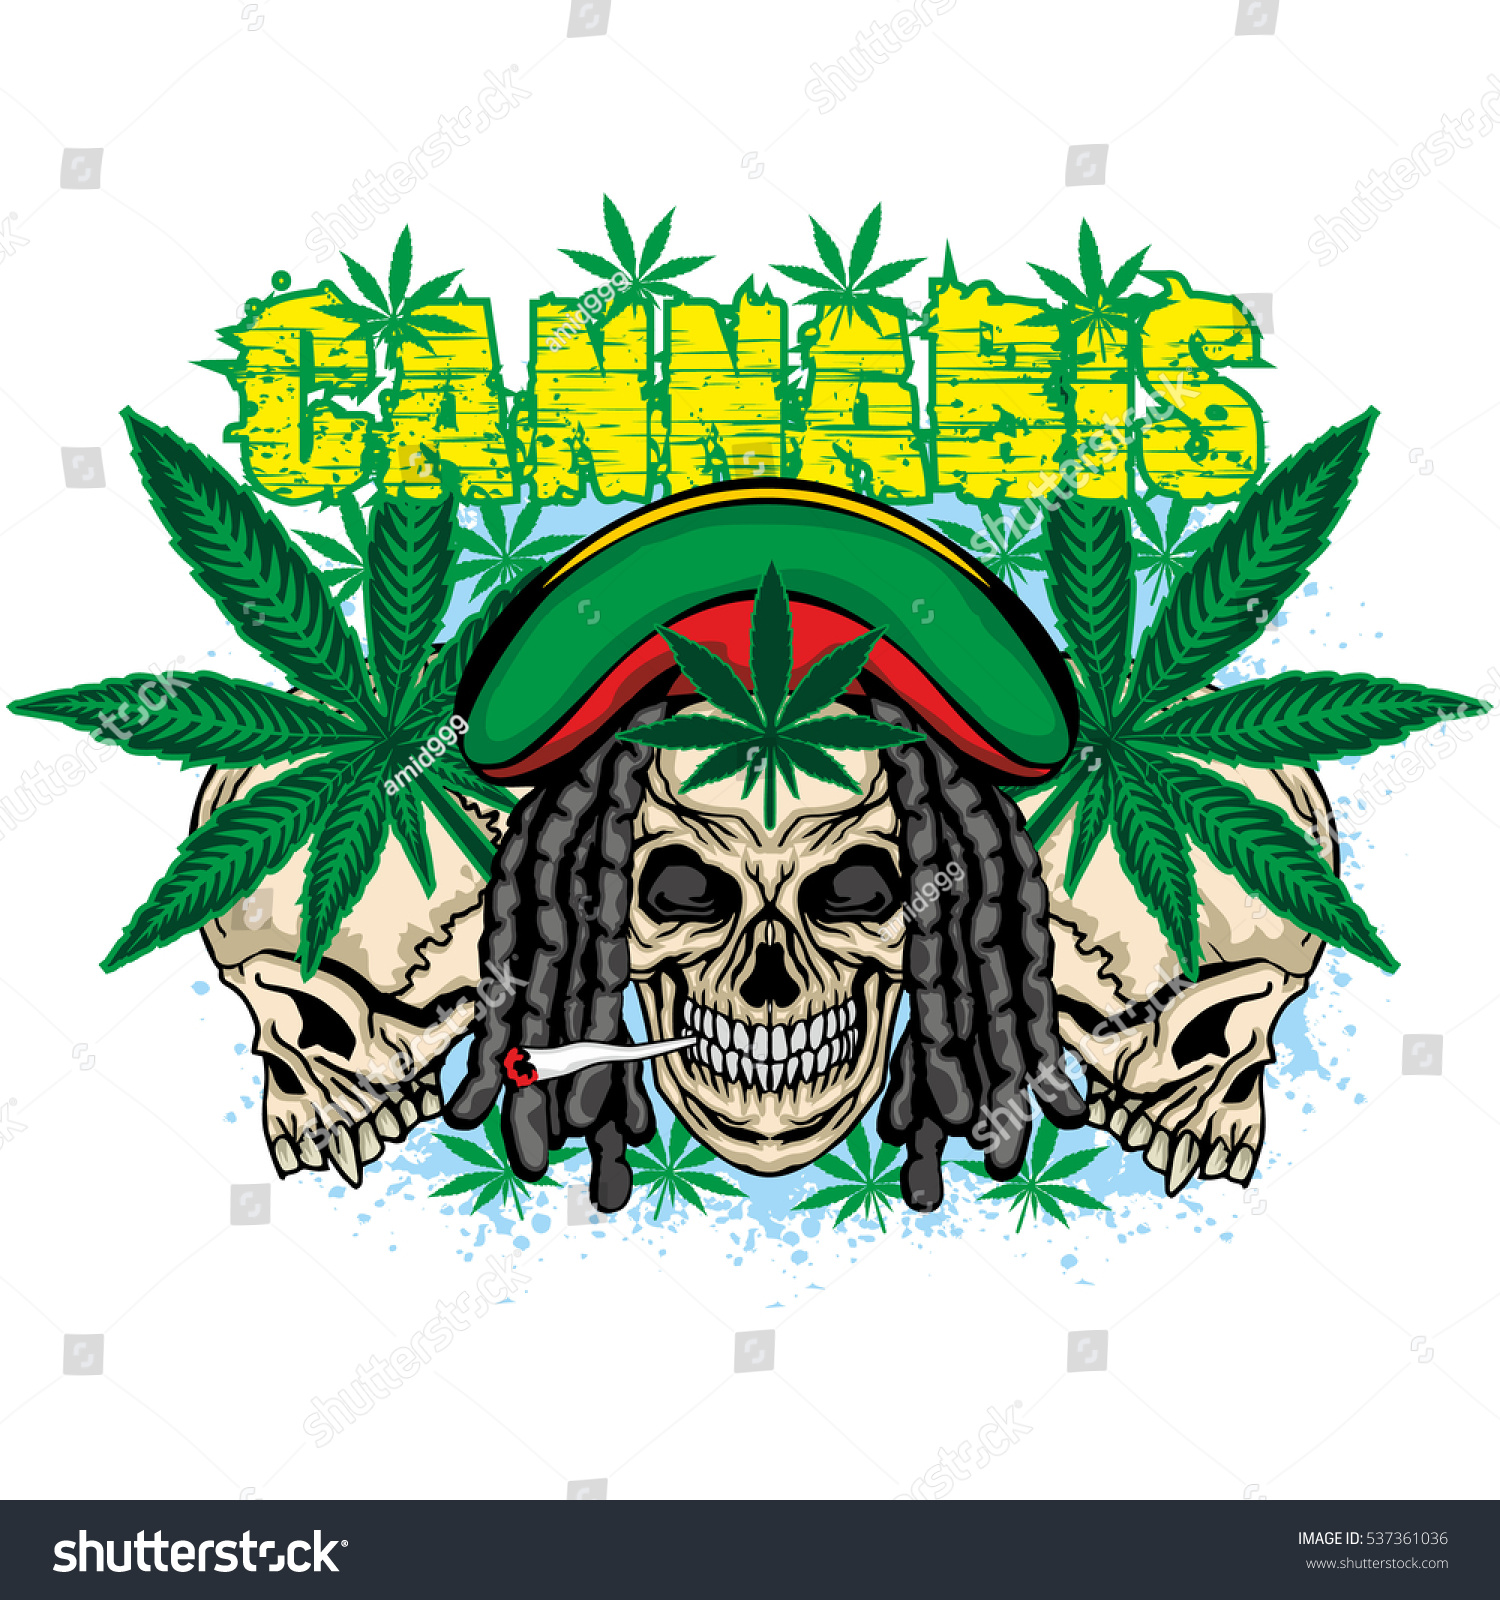 Rastafarian coat arms skull cannabis leaf stock vector 537361036 rastafarian coat of arms with skull and cannabis leaf grungentage design t biocorpaavc Image collections